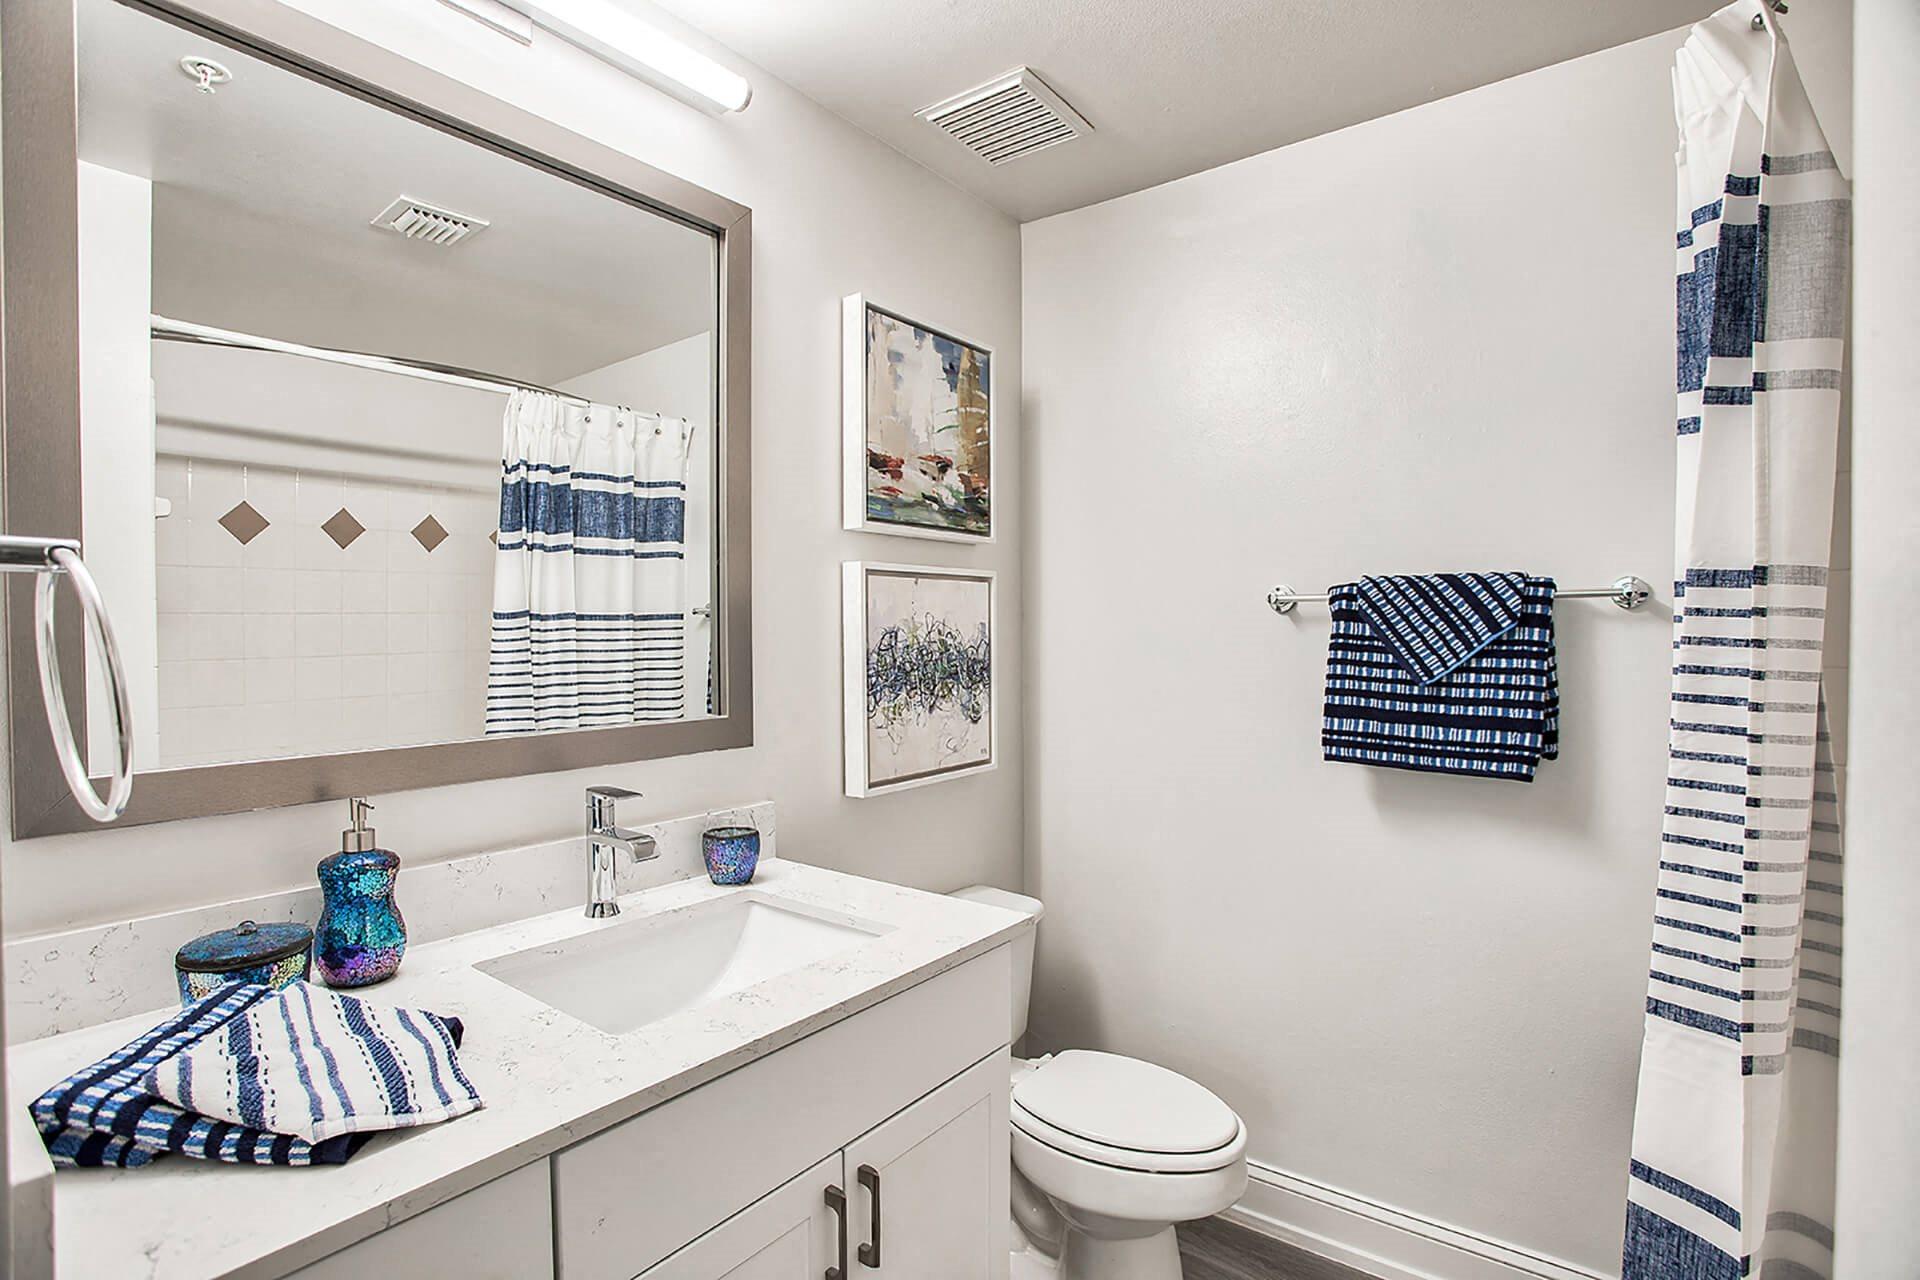 Renovated bathrooms,at Windsor at Miramar, Miramar, FL